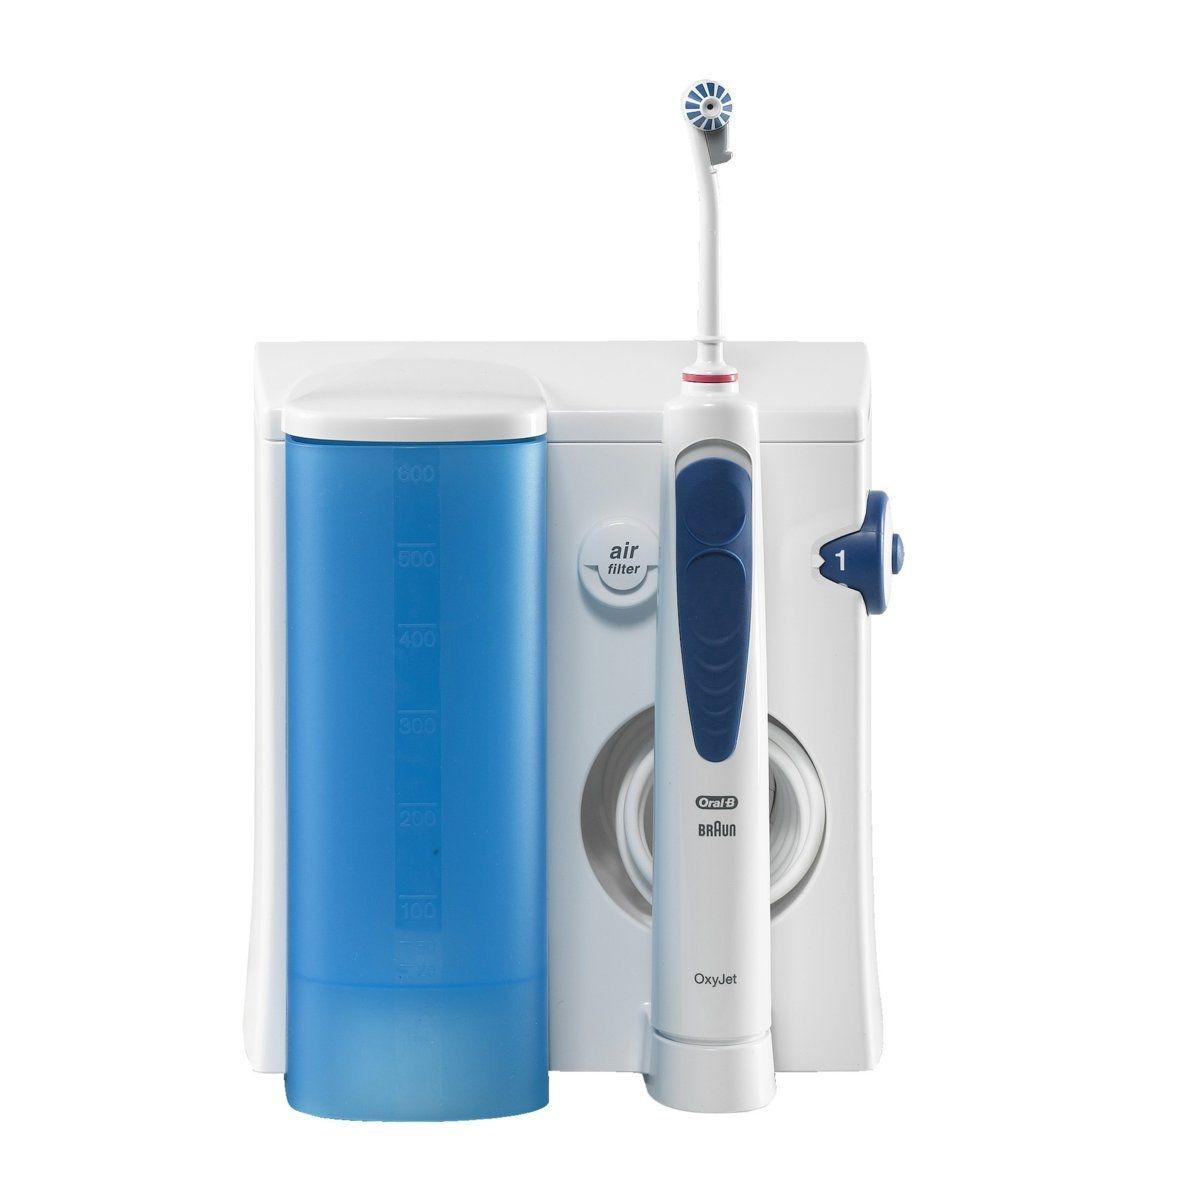 braun oral b d vitality precision clean. Black Bedroom Furniture Sets. Home Design Ideas